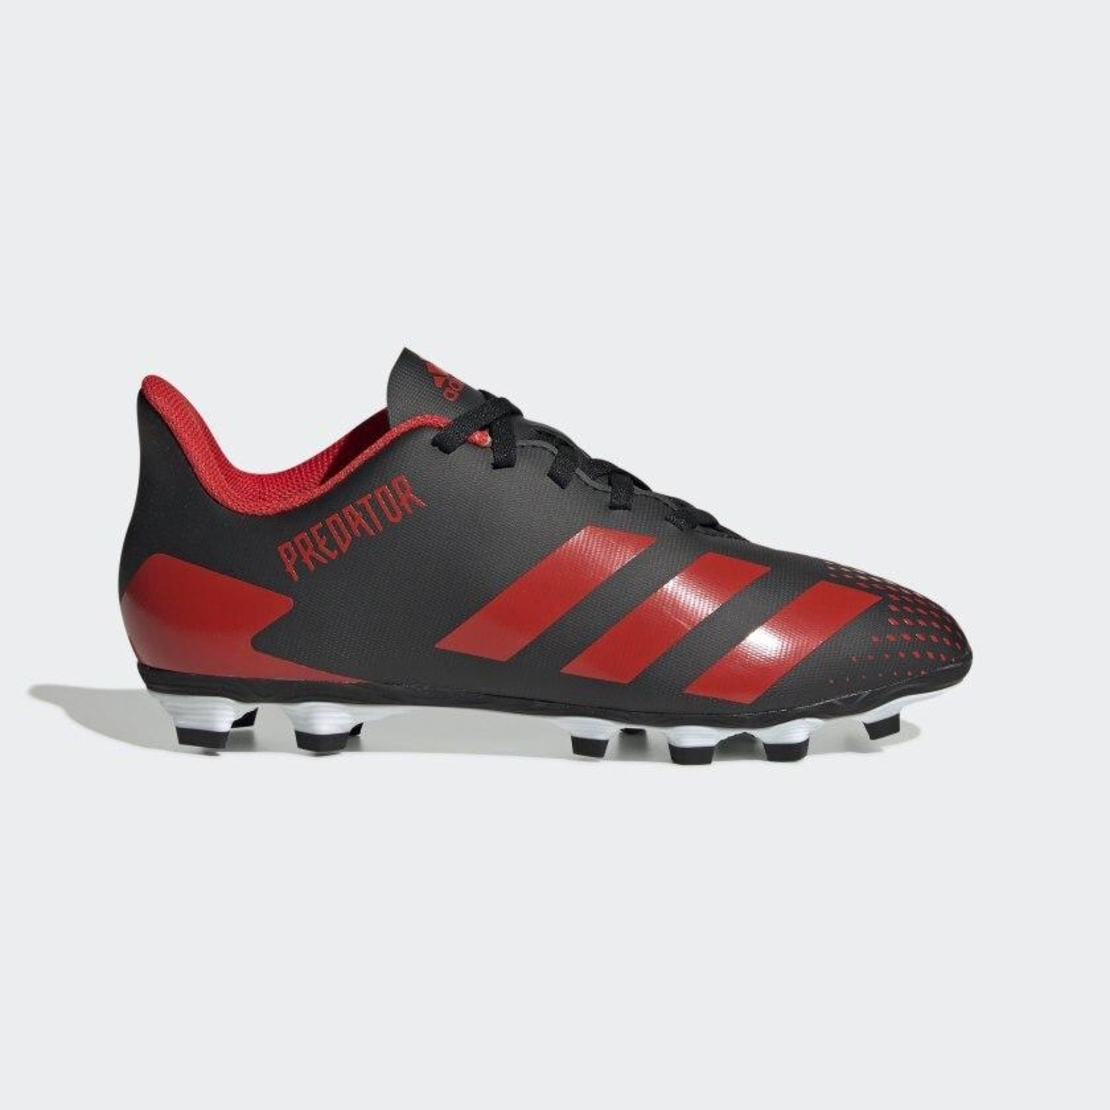 Adidas Predator 20.4 Fxg  J נעלי כדורגל לילדים ונוער